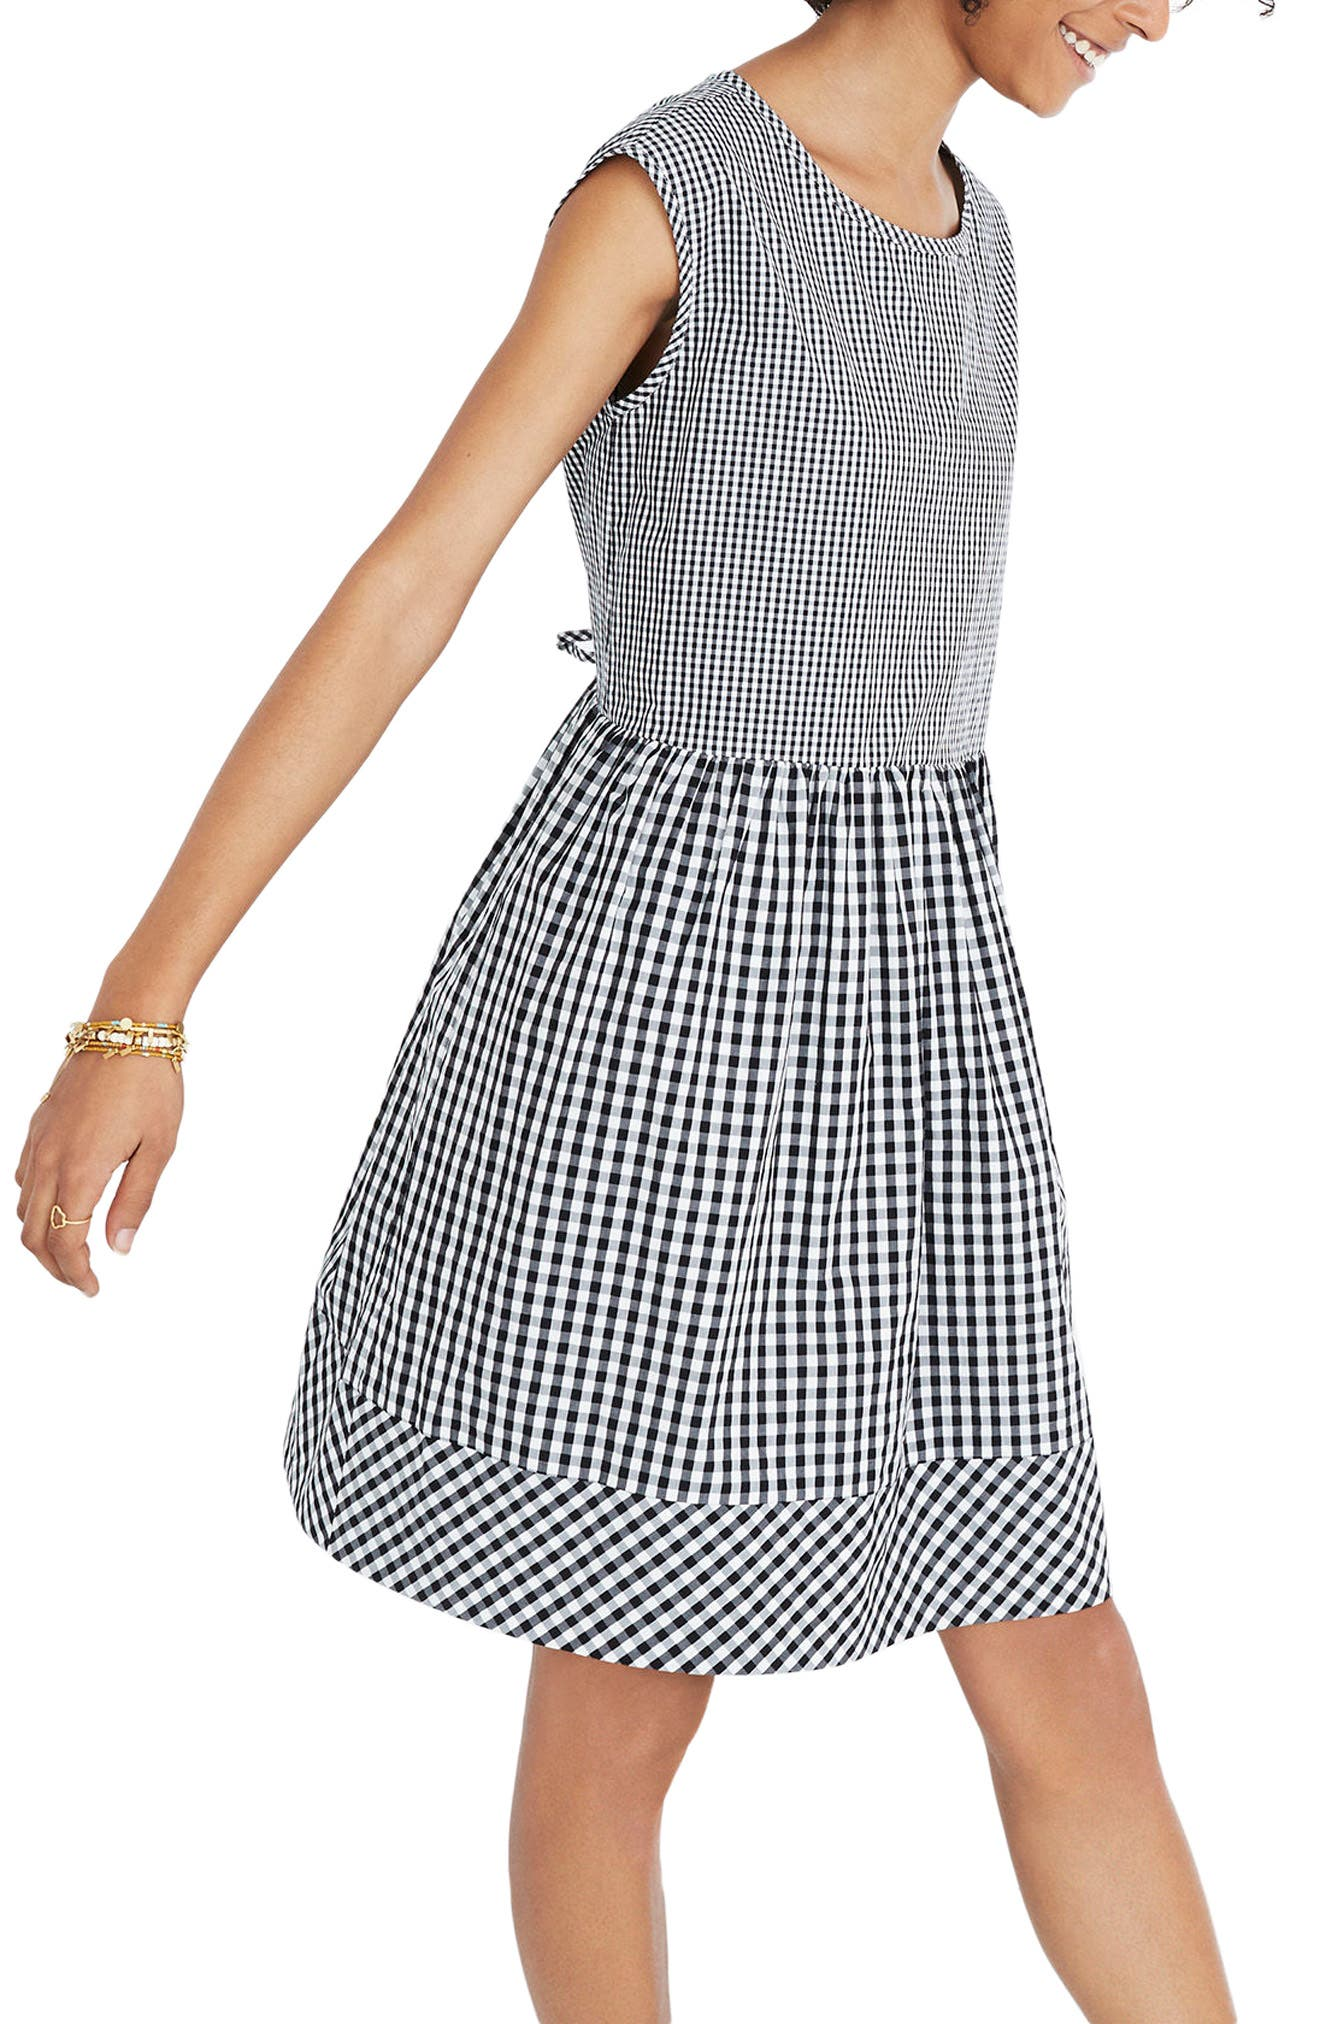 Gingham Tie Back Minidress,                             Alternate thumbnail 3, color,                             True Black